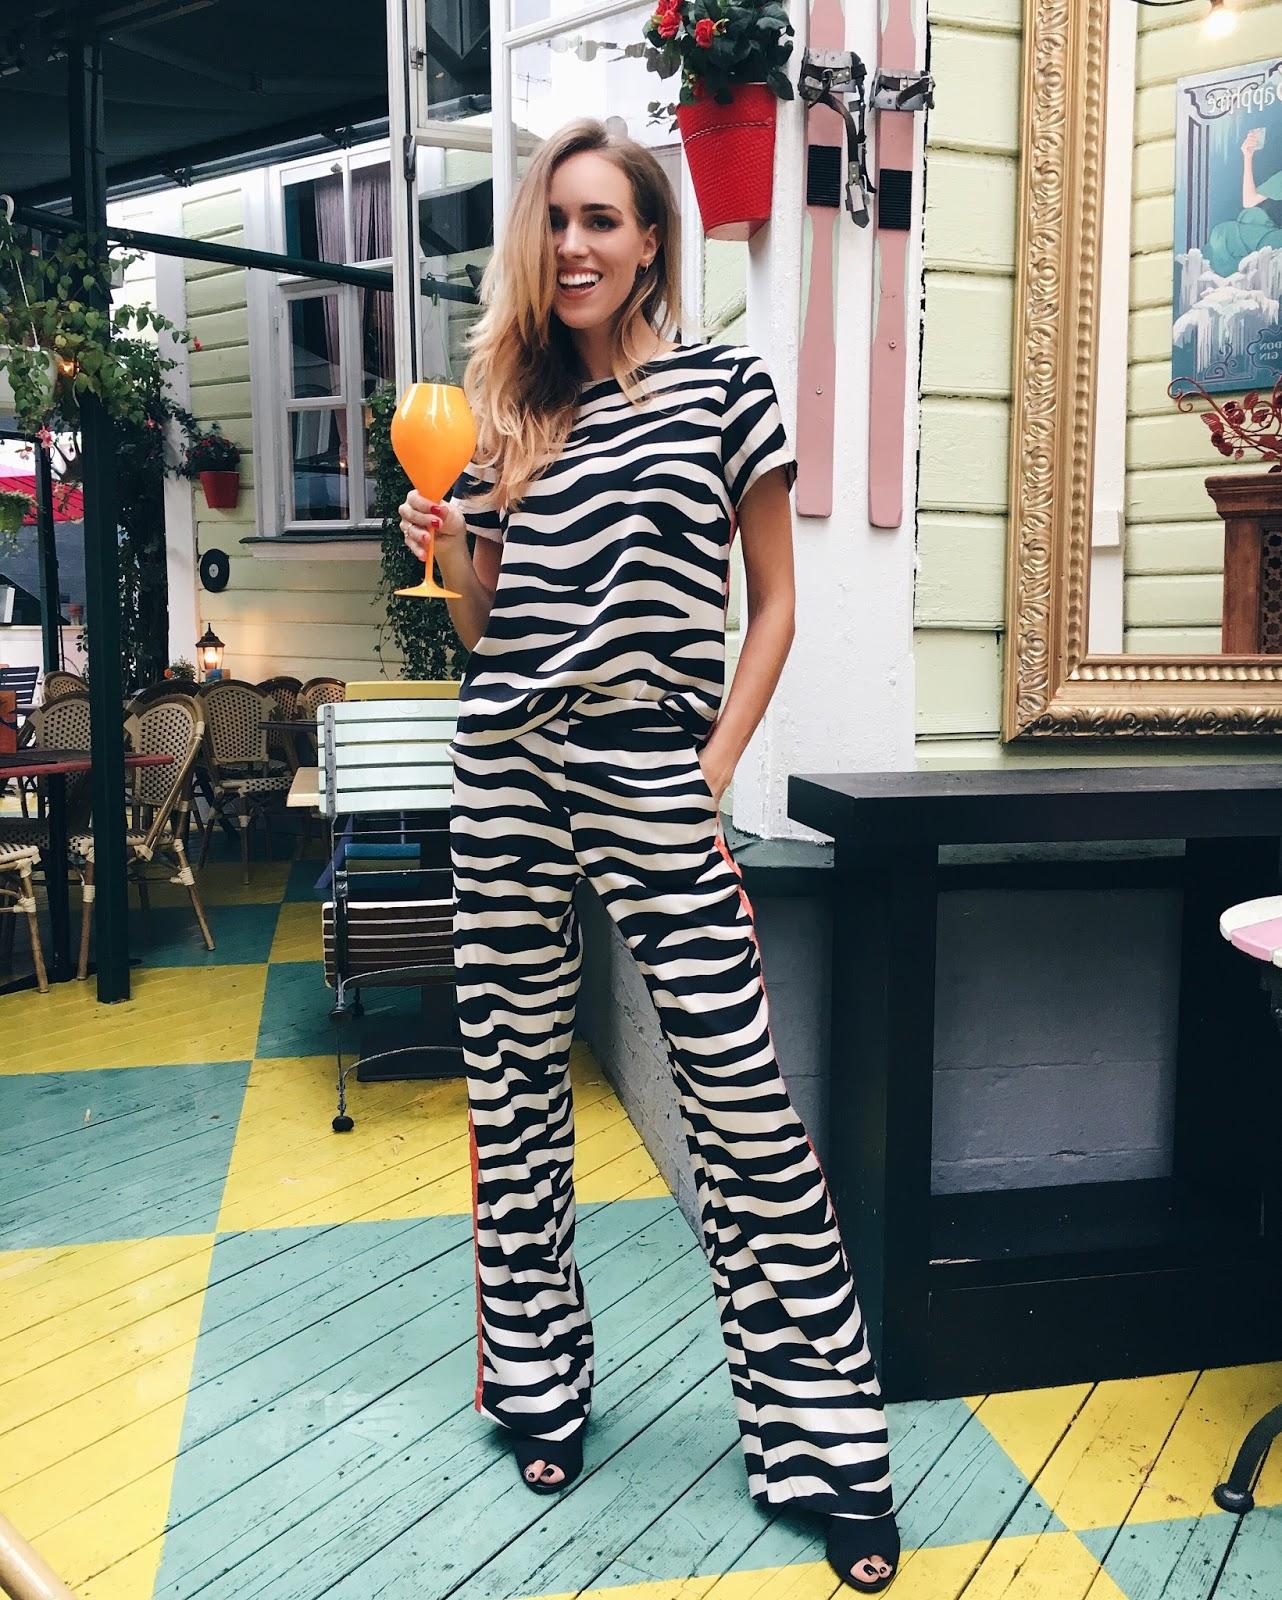 kristjaana zebra print pyjama set outfit